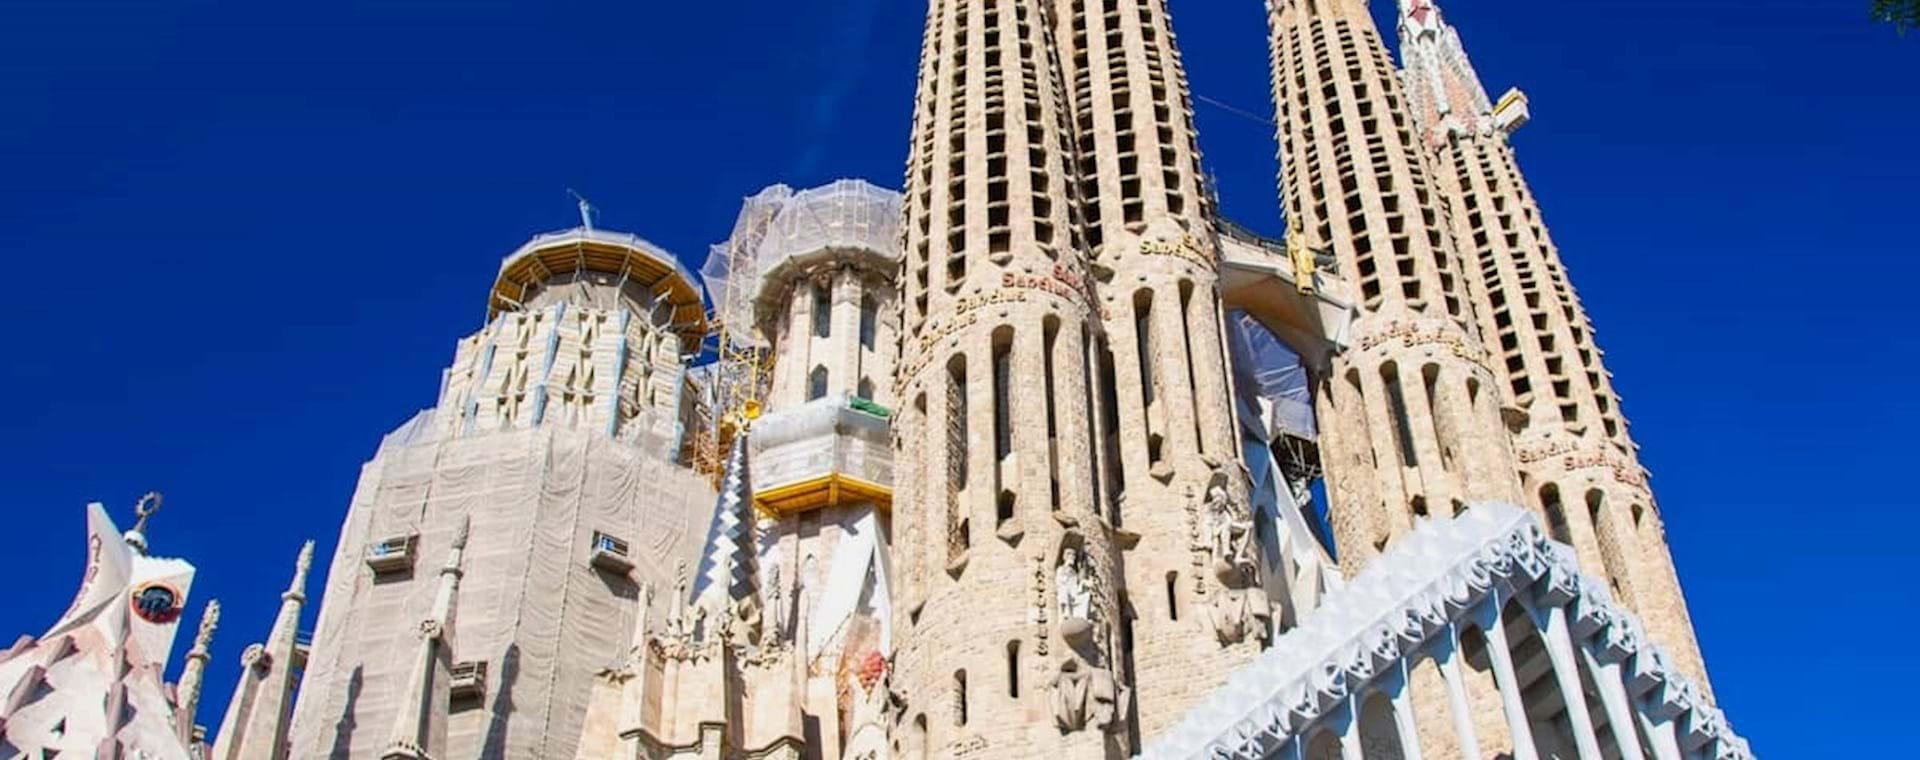 Exterior of art nouveau style cathedral Sagrada Familia in Barcelona